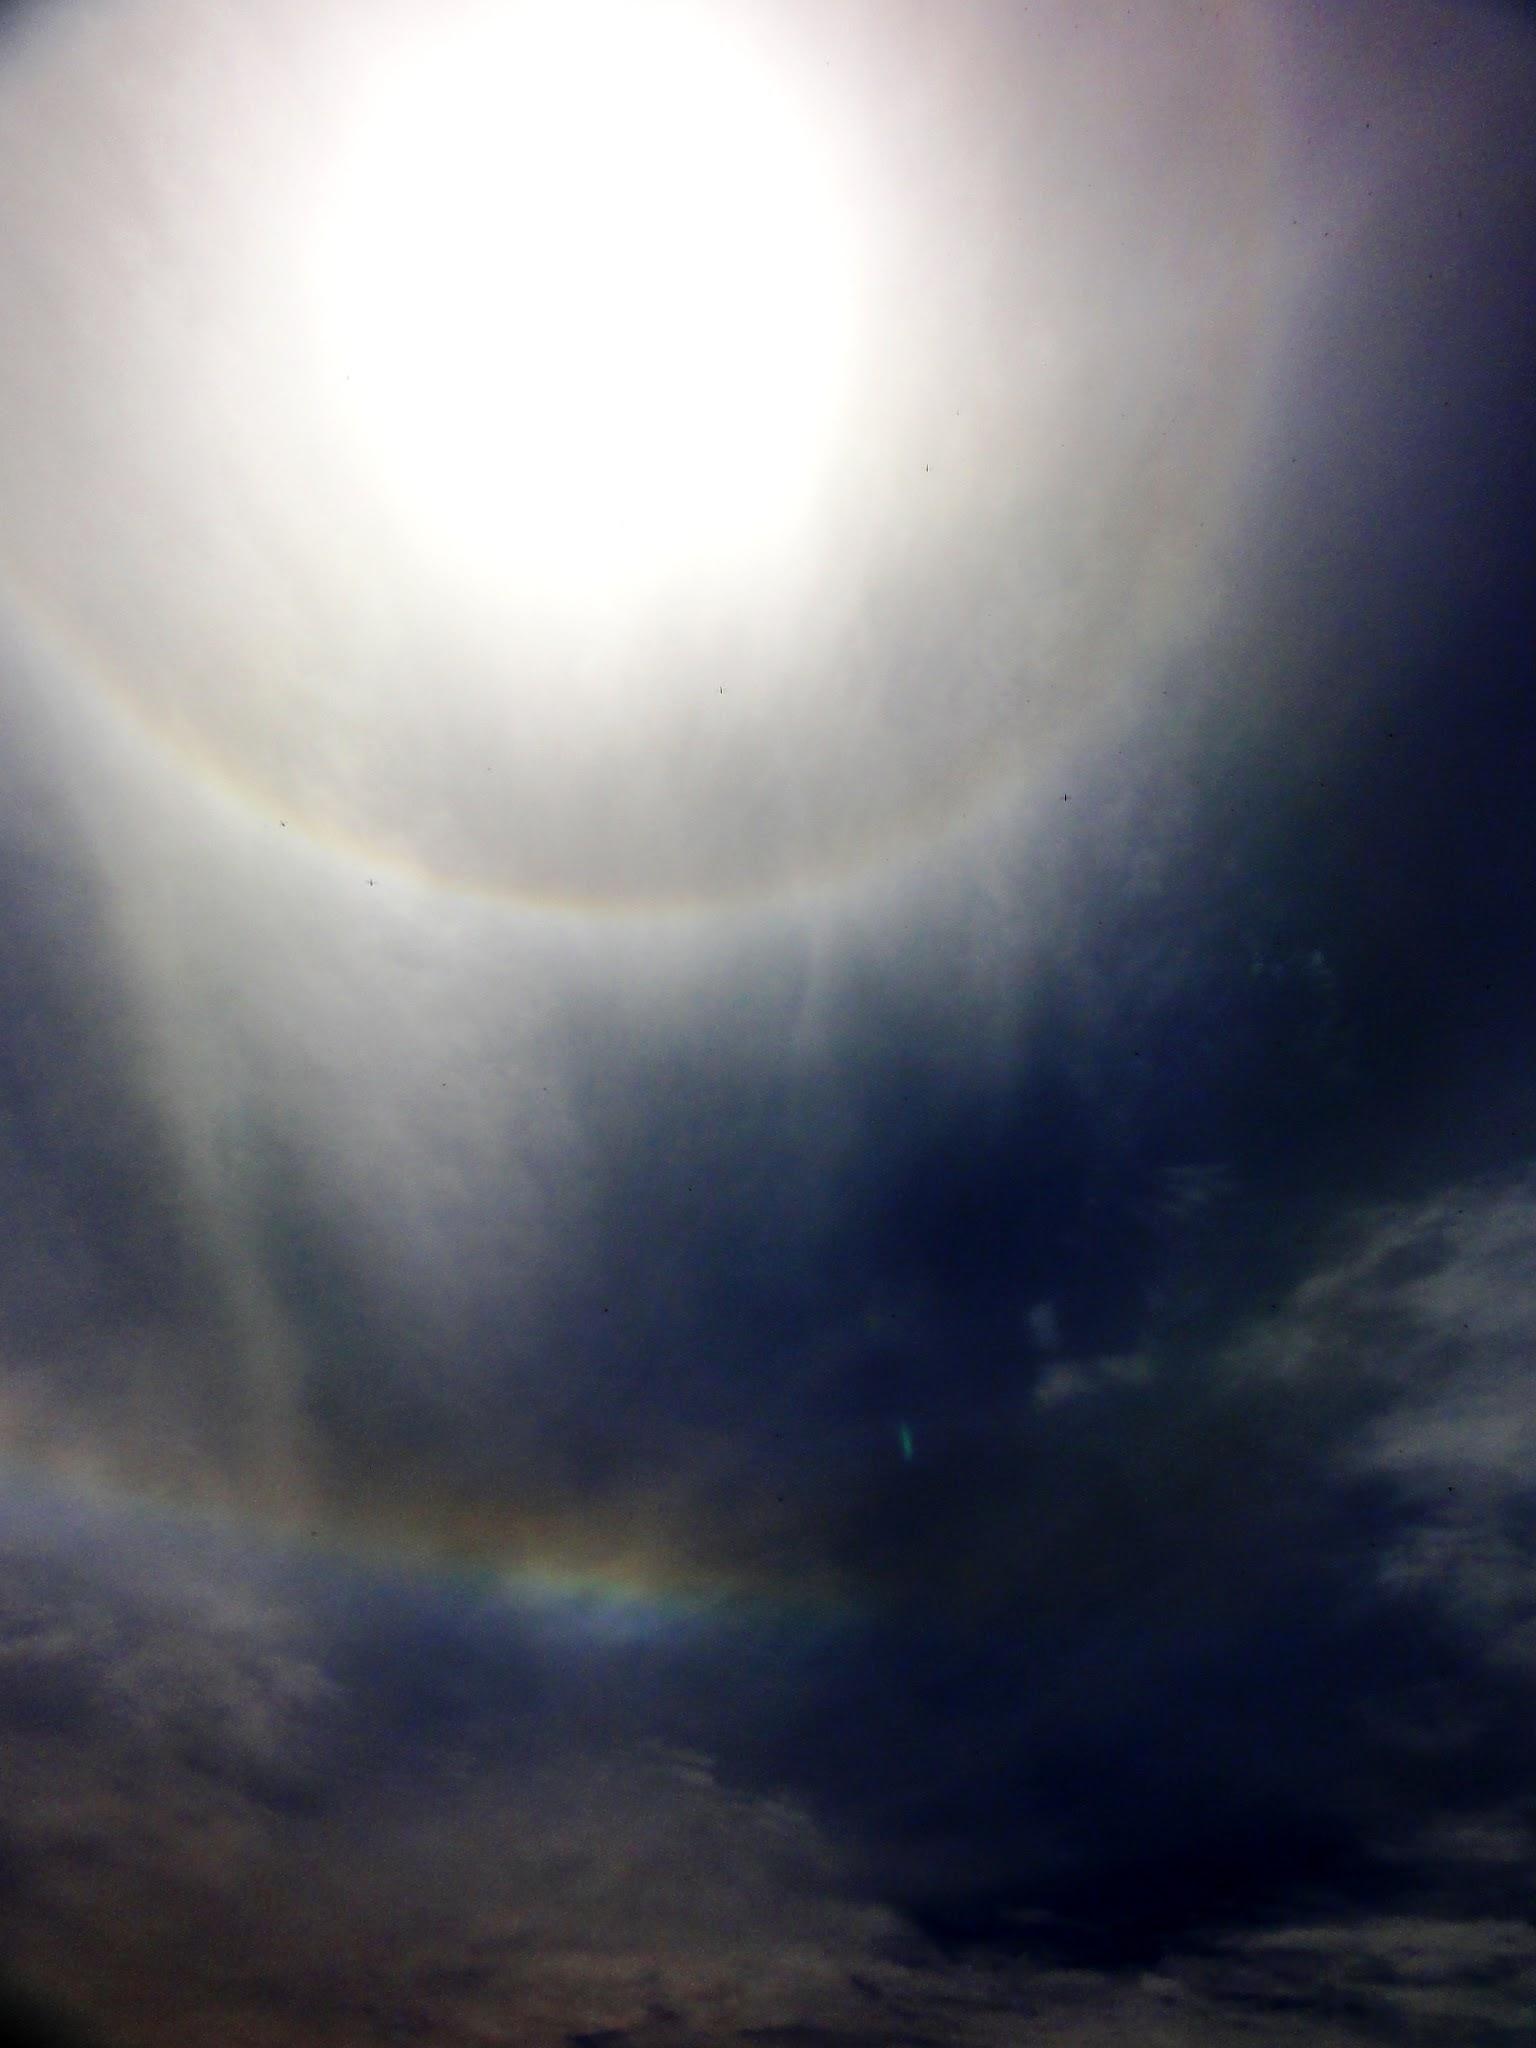 Photo: 露出を絞って出ないと白い雲のみ